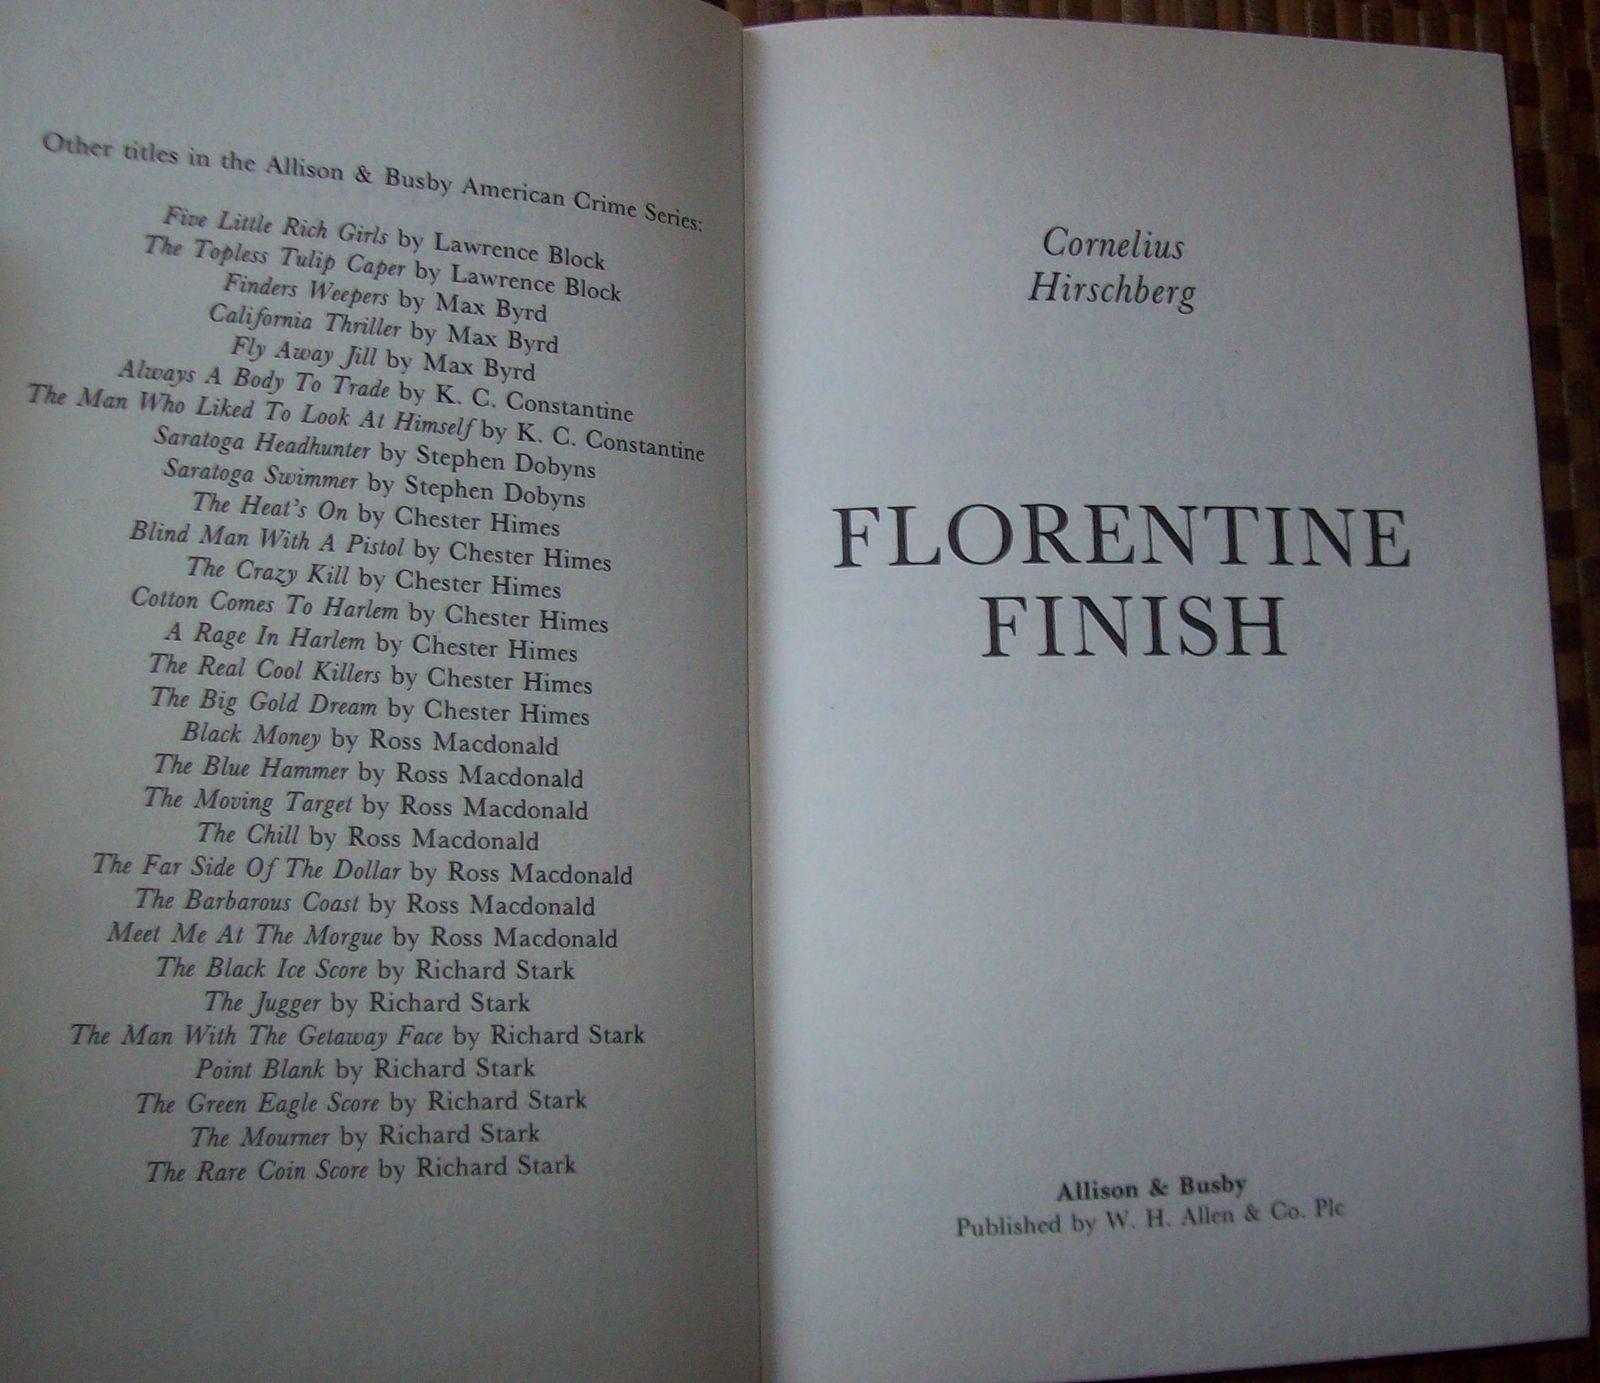 Florentine Finish by Cornelius Hirschberg 1988 HBDJ Diamonds